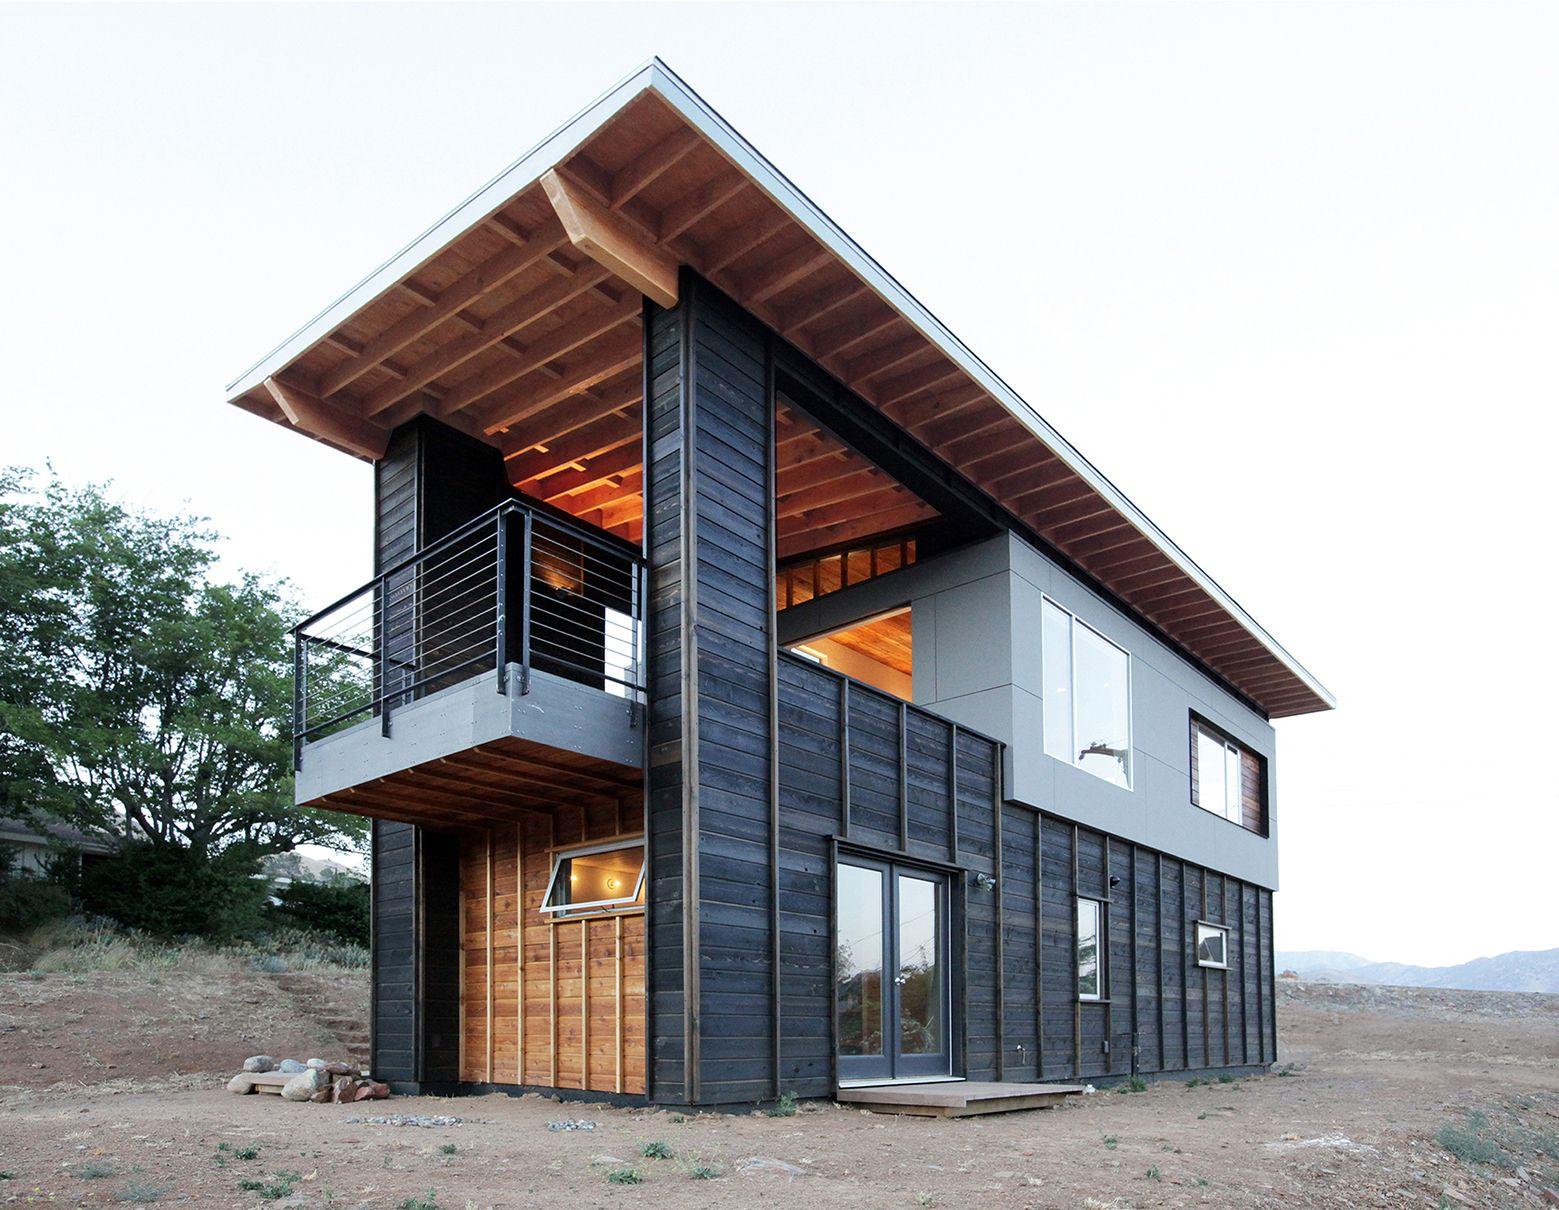 510 cabin small house hunter leggitt studio california floor plan humble homes housie pinterest family getaways hunters and modern family